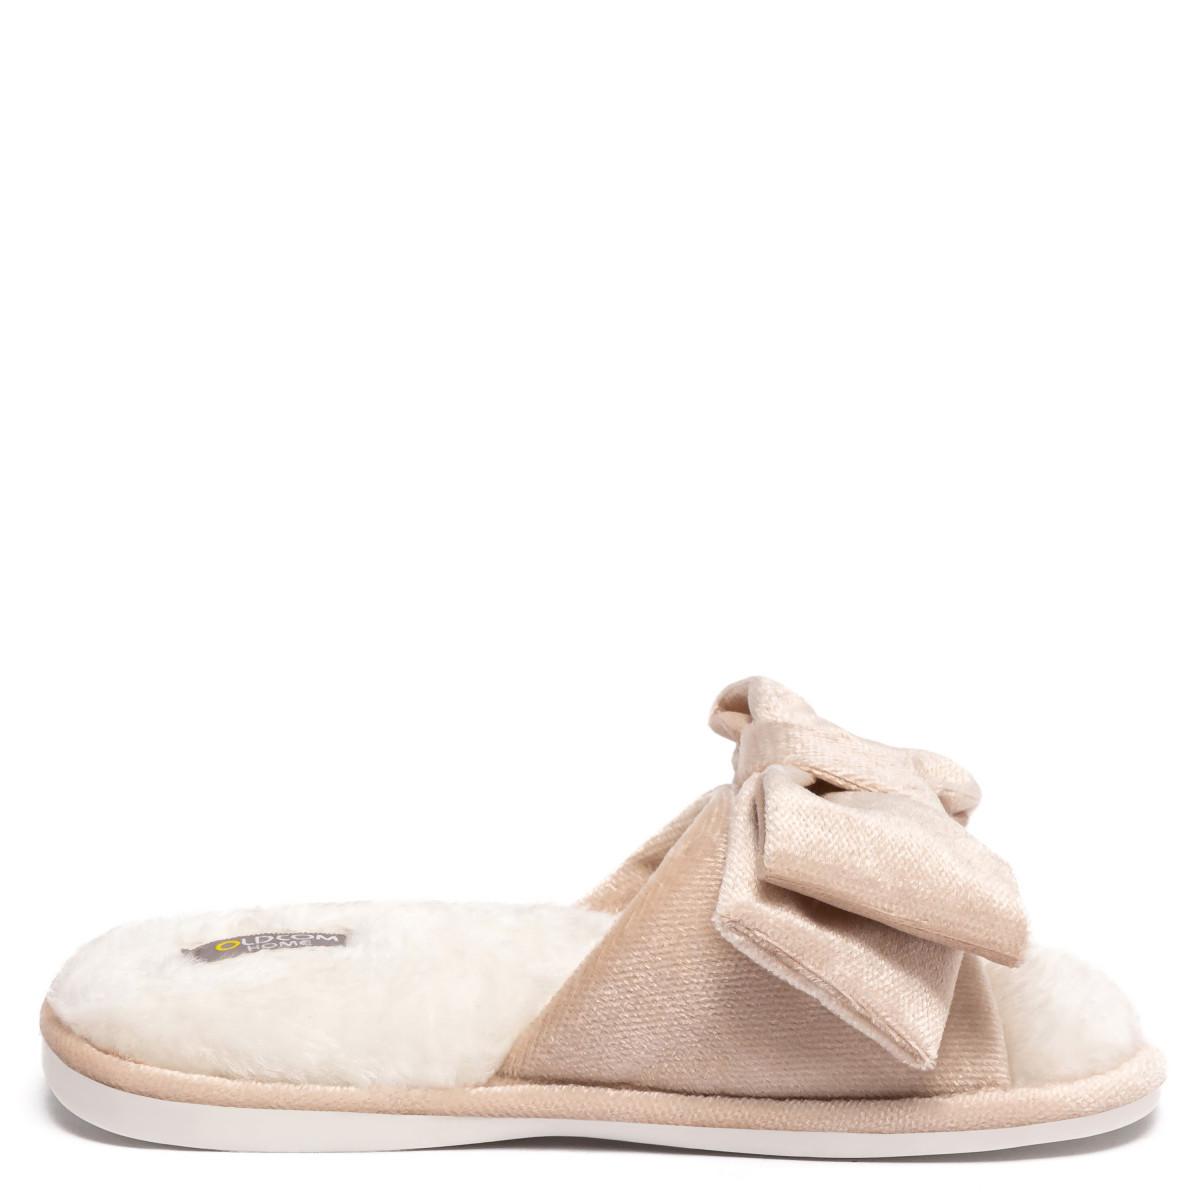 Kid's home slippers CHARM, Ivory